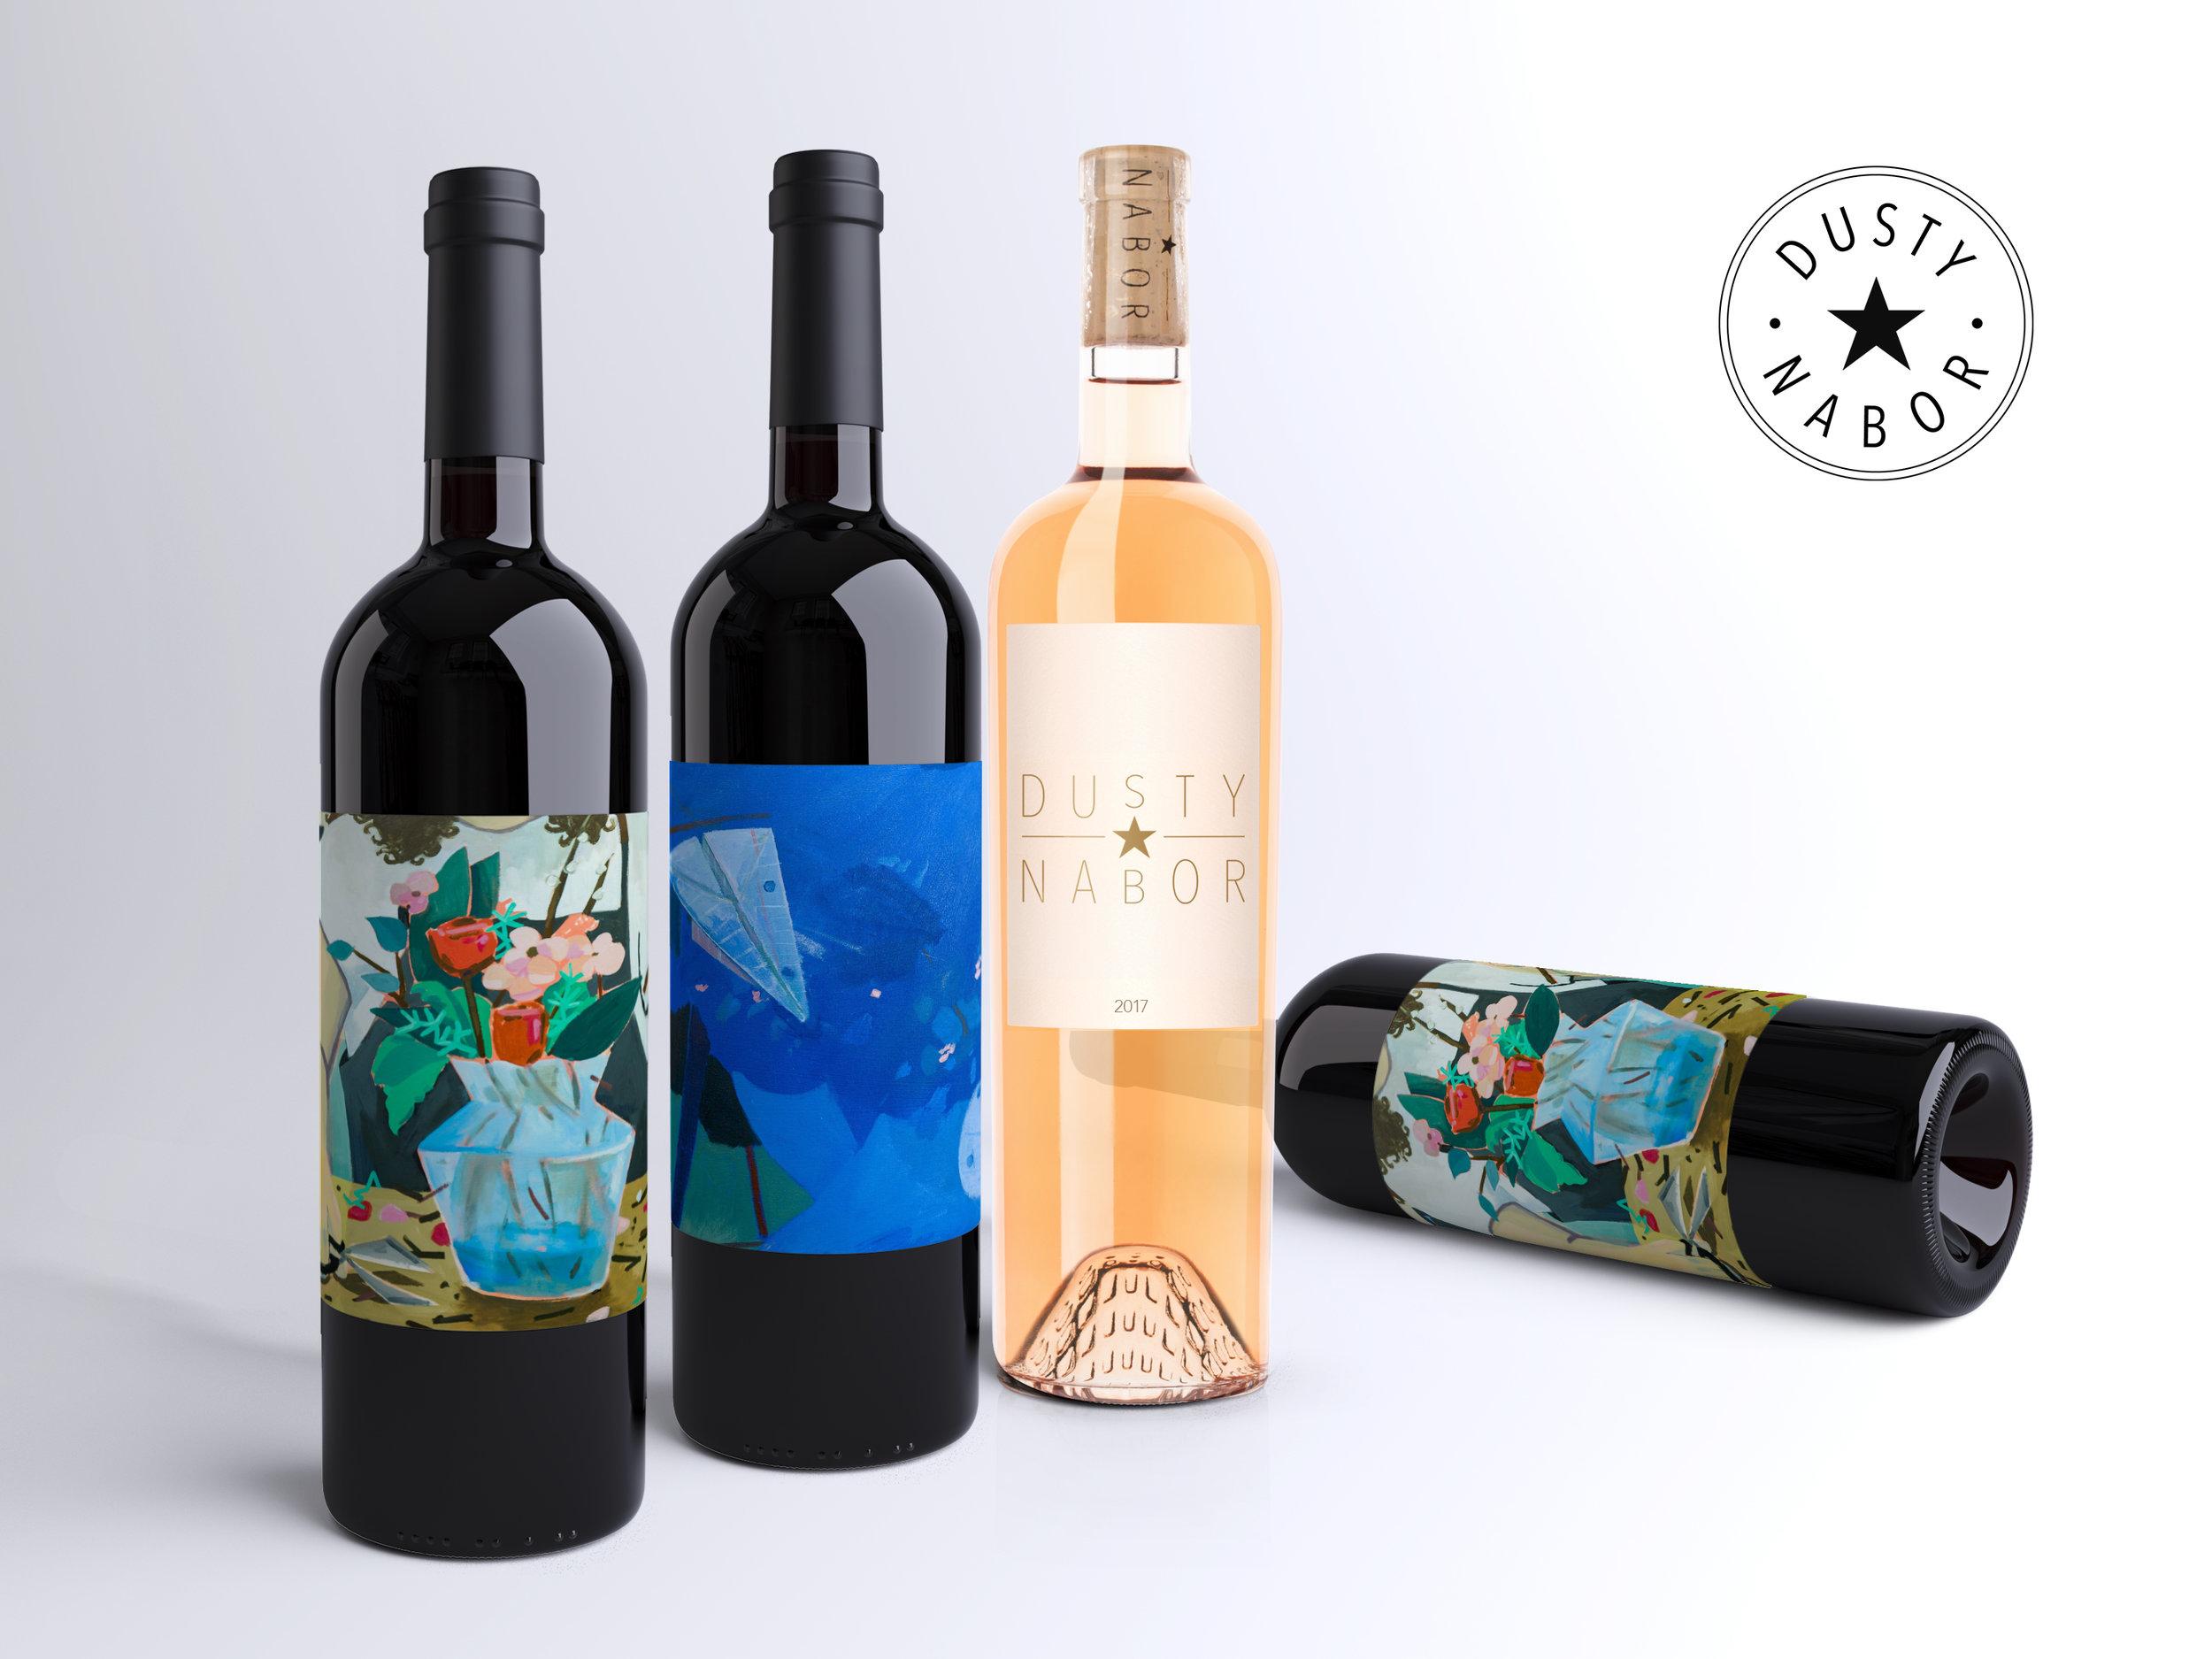 dusty-nabor-wine-lineup.jpg